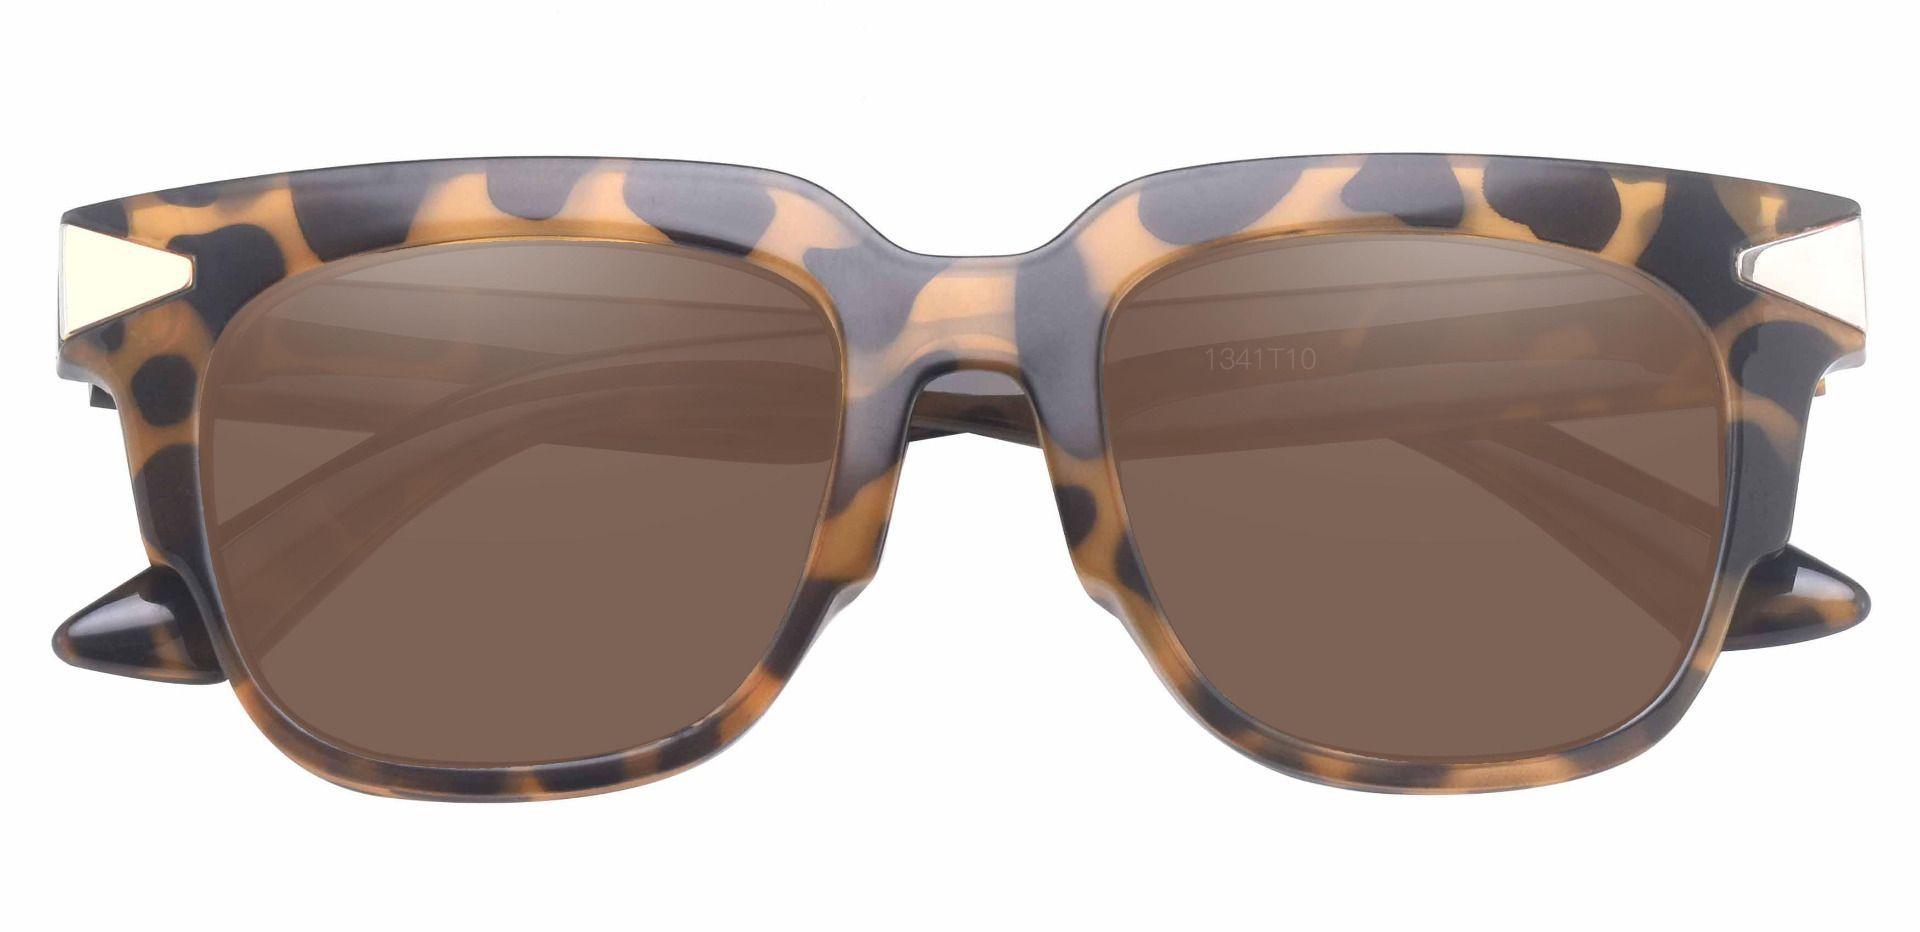 Ardent Square Progressive Sunglasses - Tortoise Frame With Brown Lenses